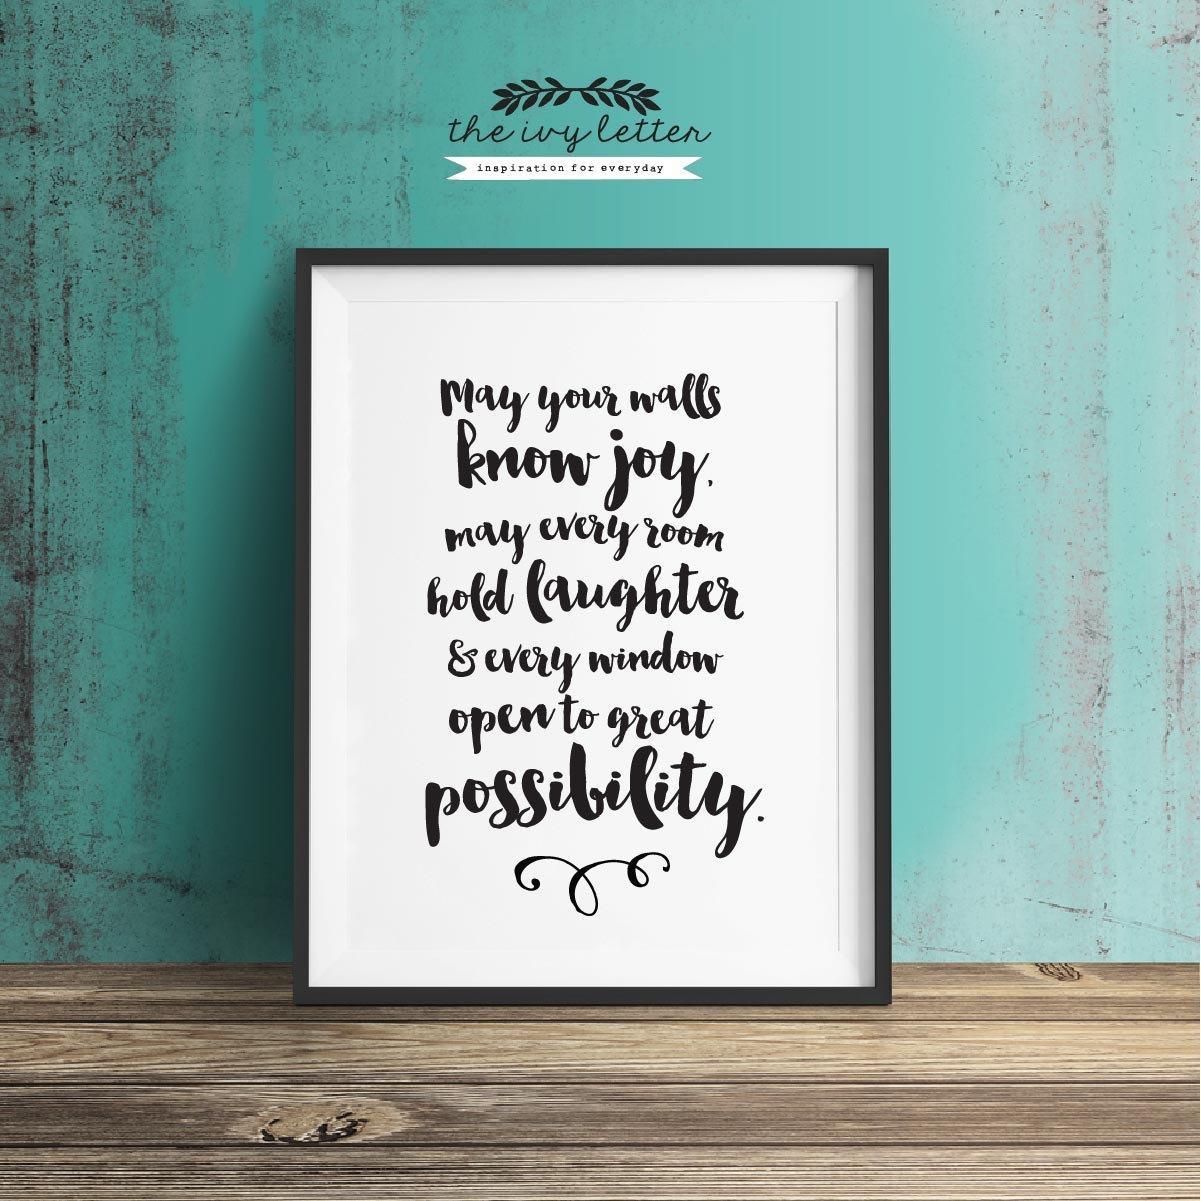 May Your Walls Know Joy Printable Wall Art Quotes Within Printable Wall Art Quotes (View 6 of 20)